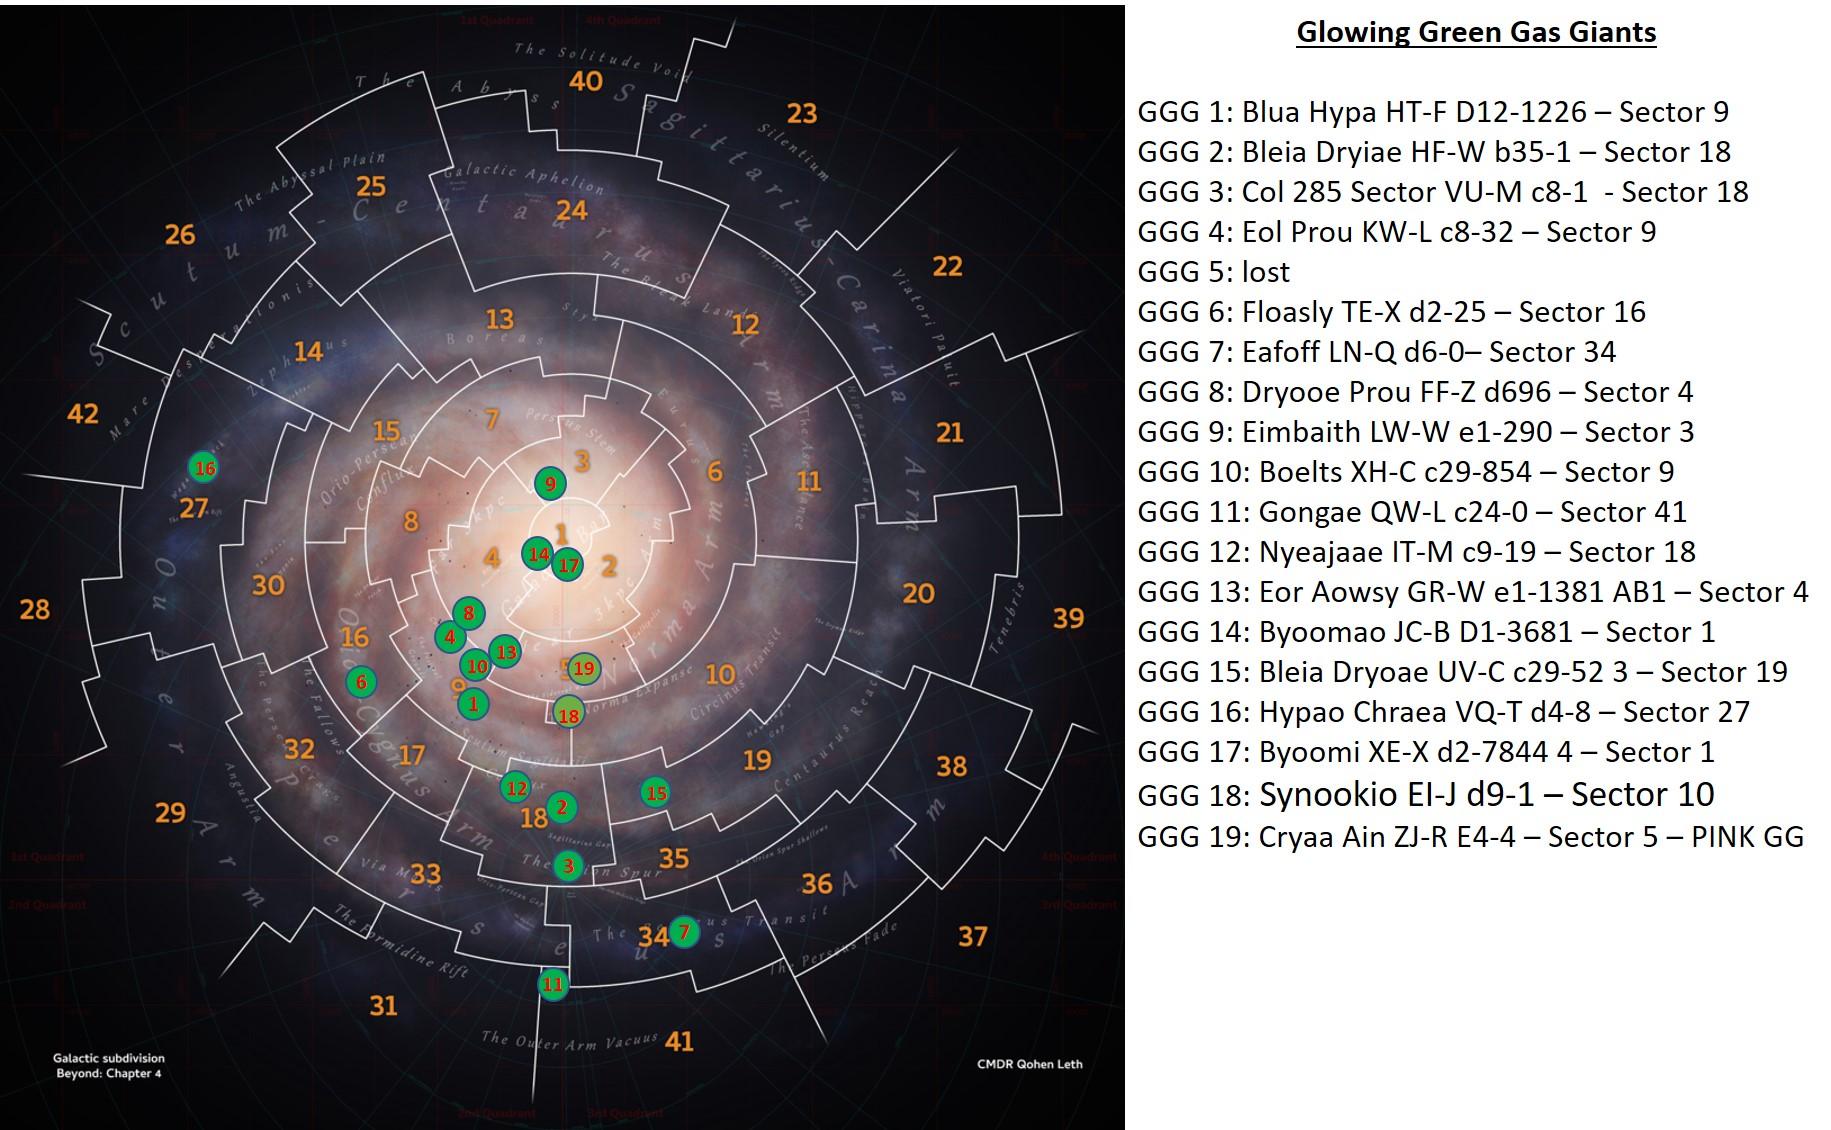 Glowing Green Gas Giants Map (22 Sep 2019).jpg